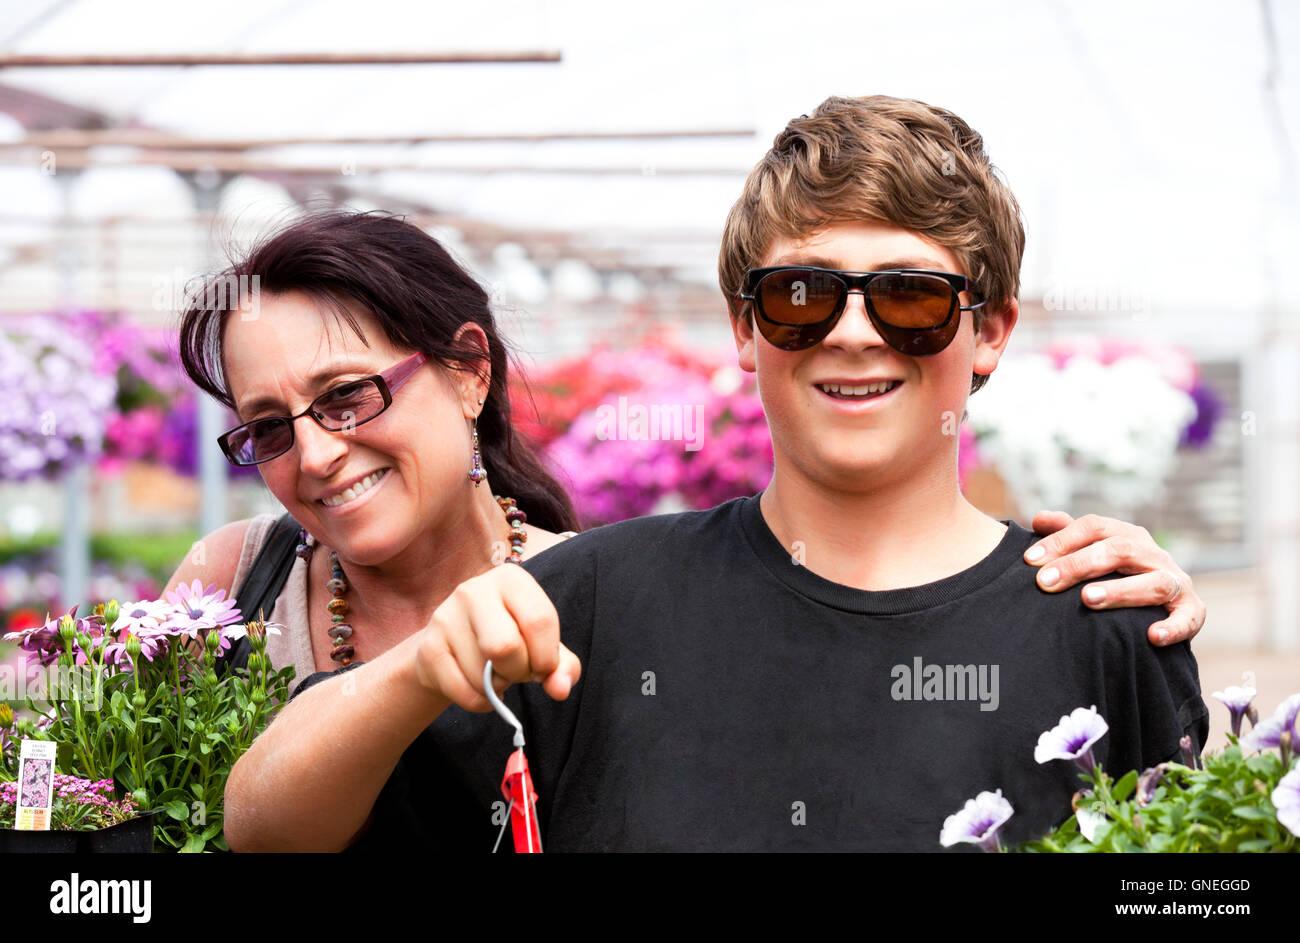 Mom Son Shopping Stockfotos & Mom Son Shopping Bilder - Alamy